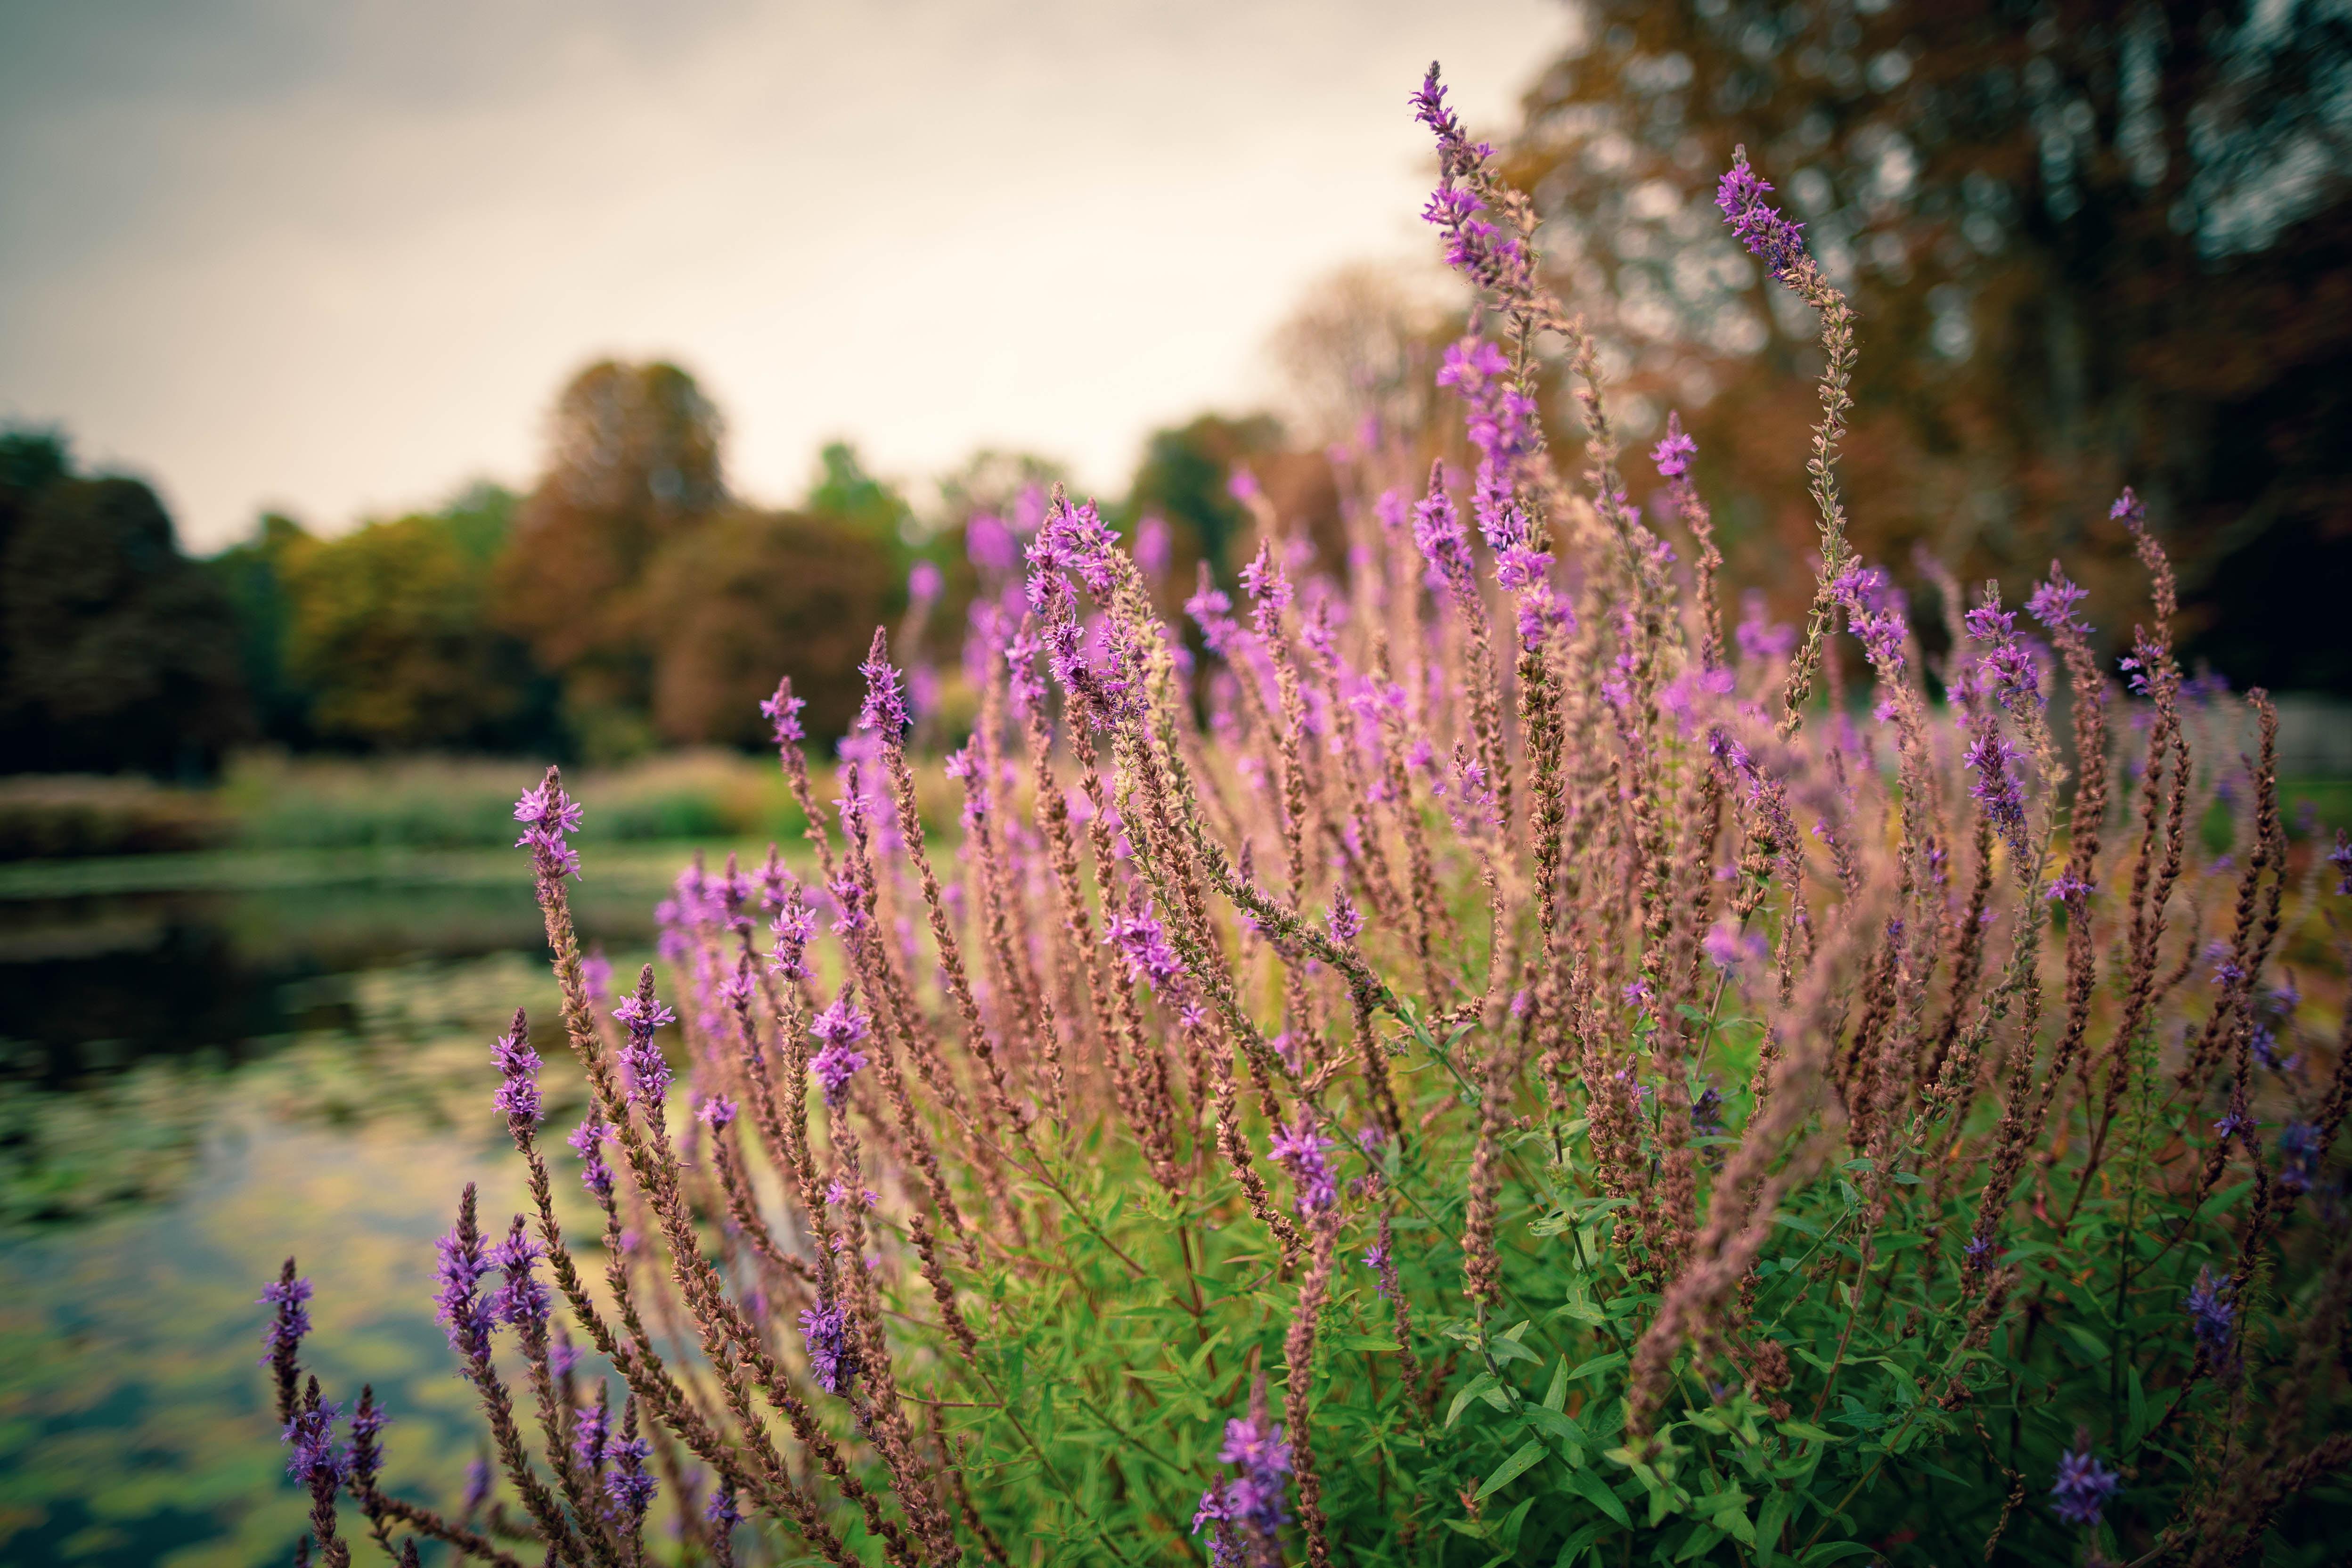 macro photography of purple hyssop flowers